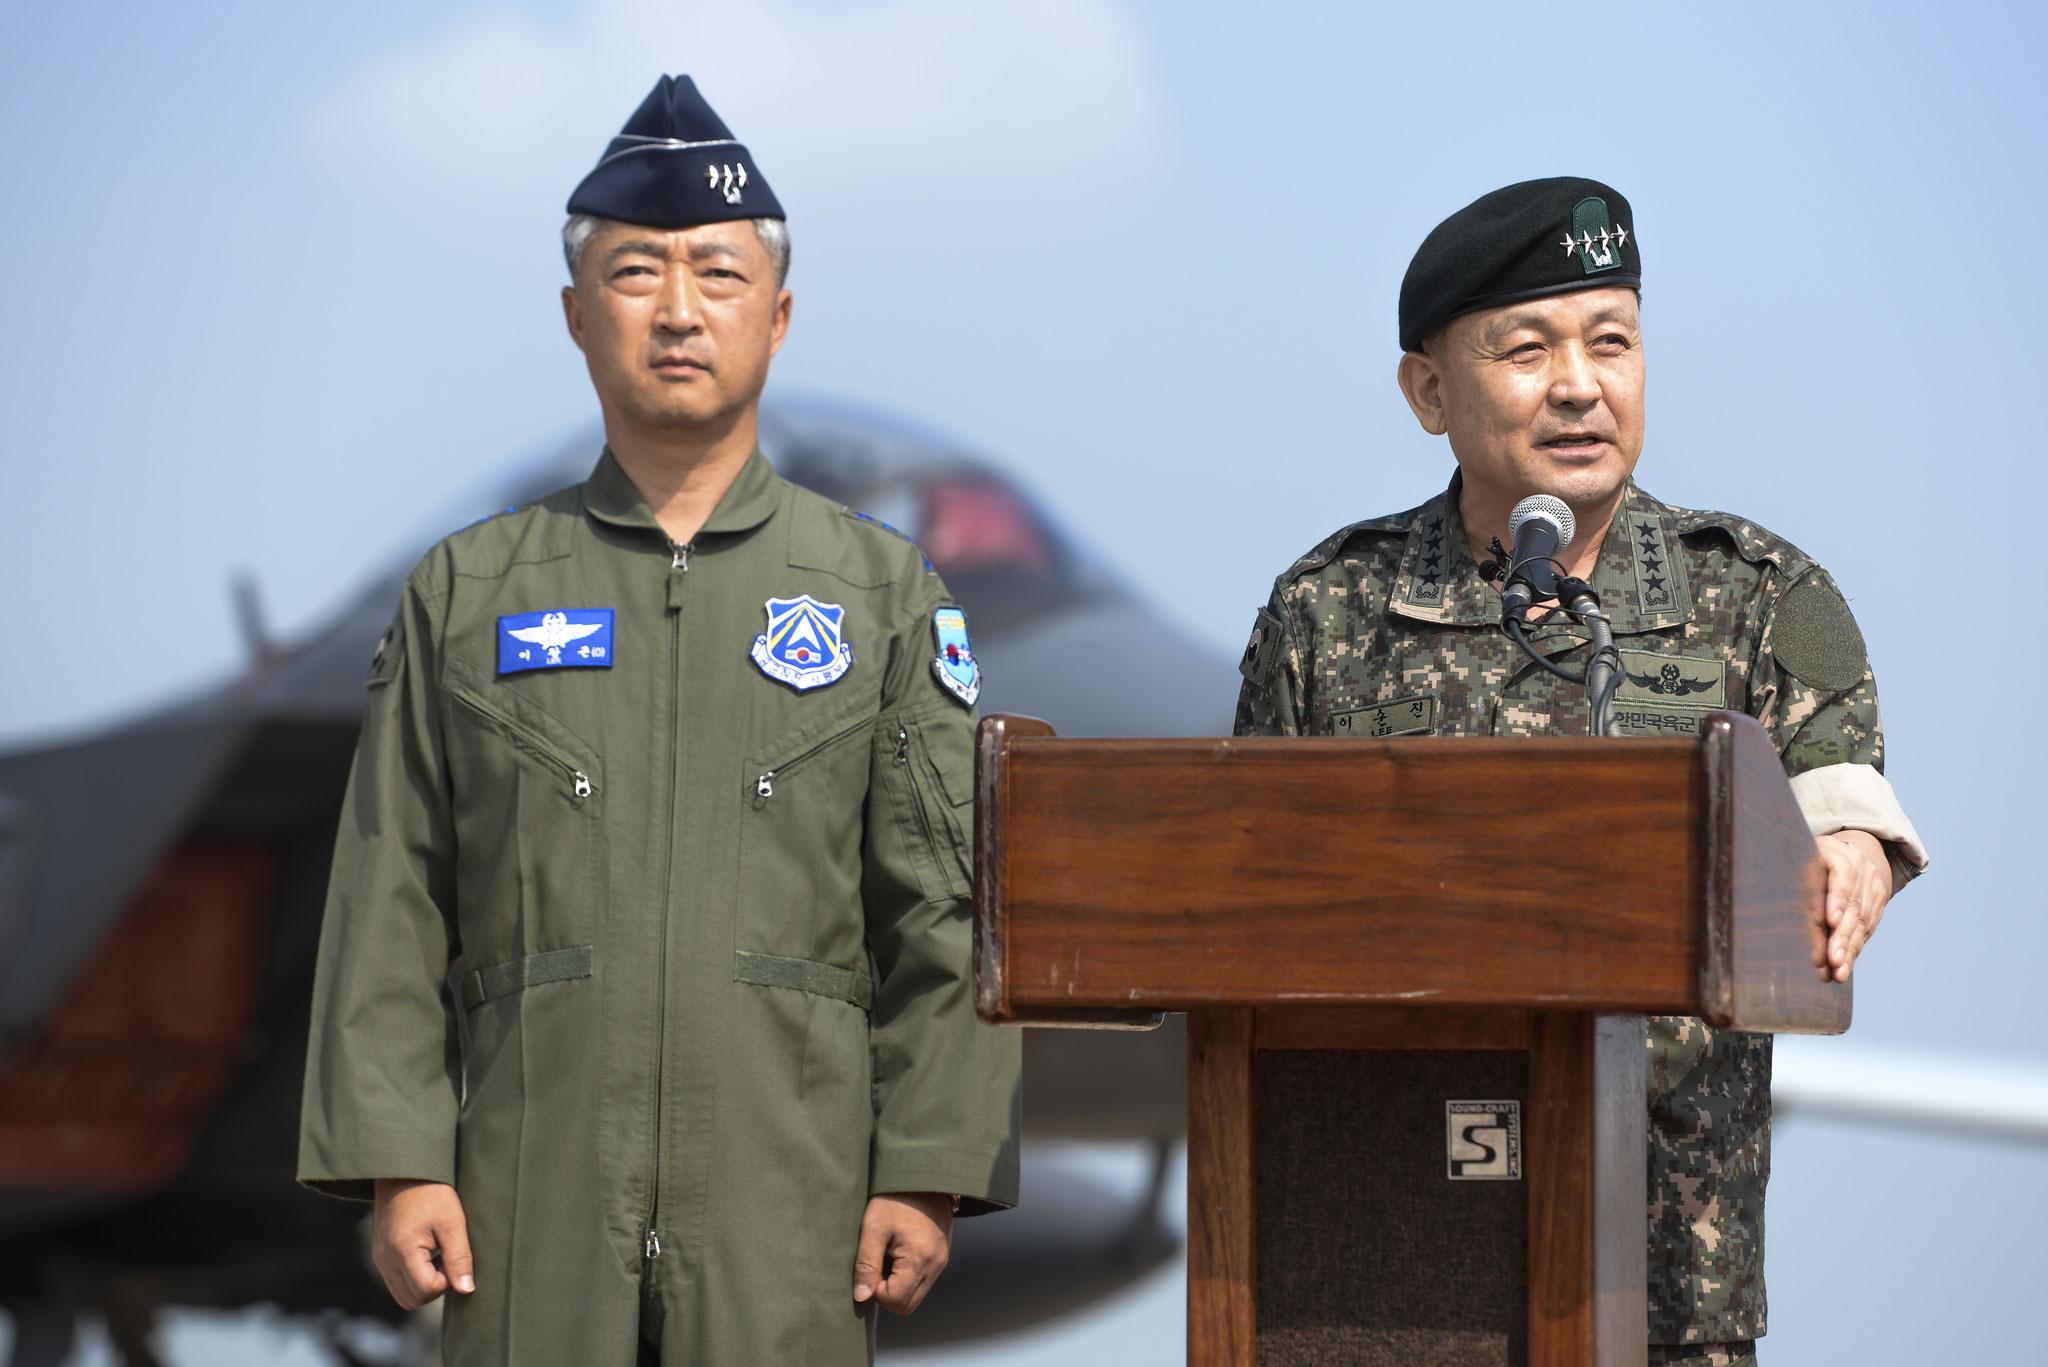 da sinistra il gen. Lee Wang Keun comandante della ROKAF assieme al gen. Lee Sun Jin durante il discorso.